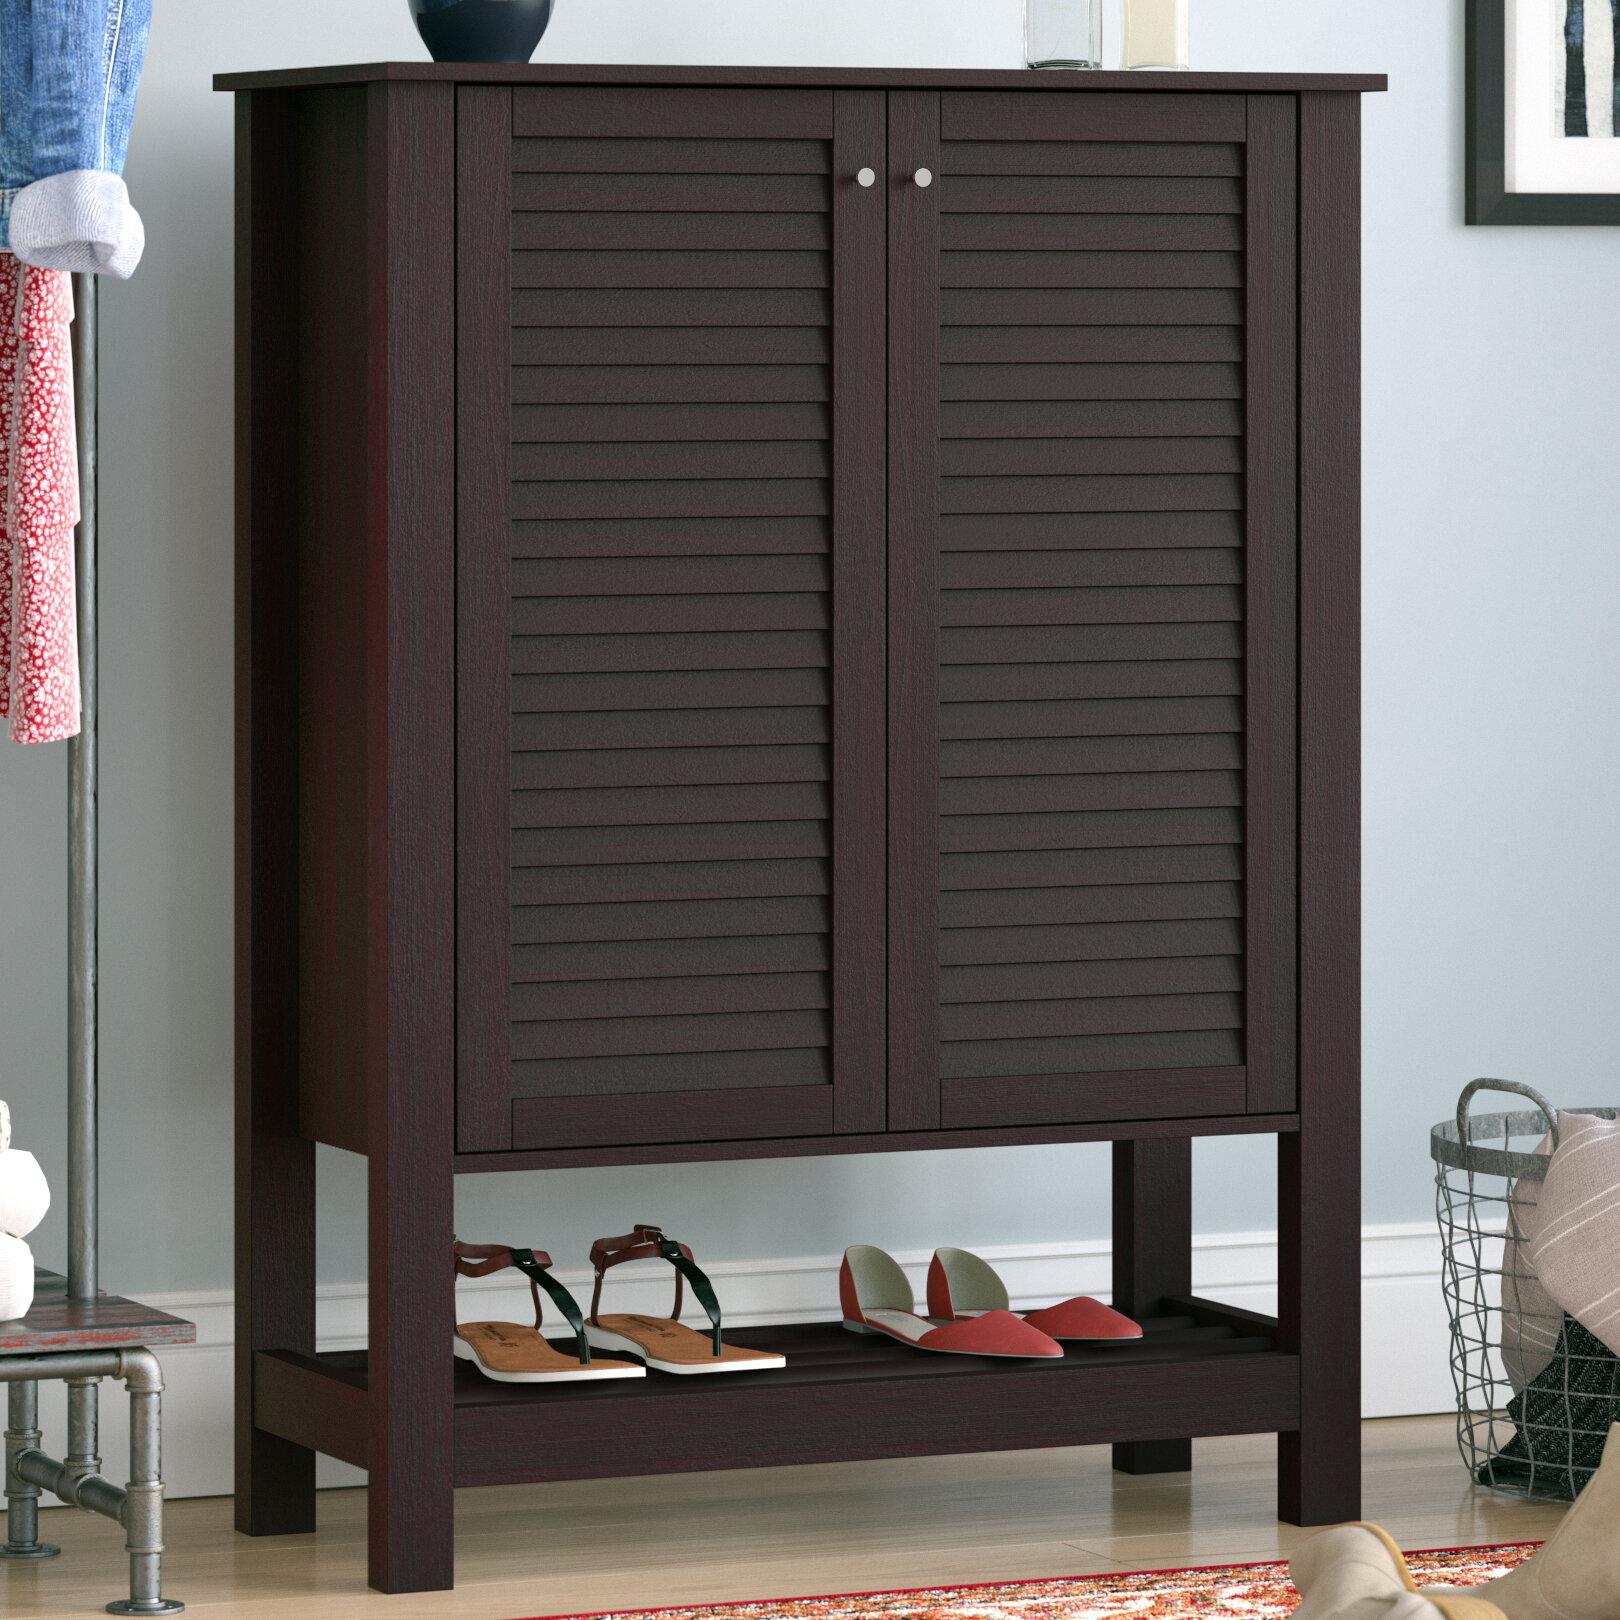 15 Pair Mdf Shoe Storage Cabinet Reviews Birch Lane